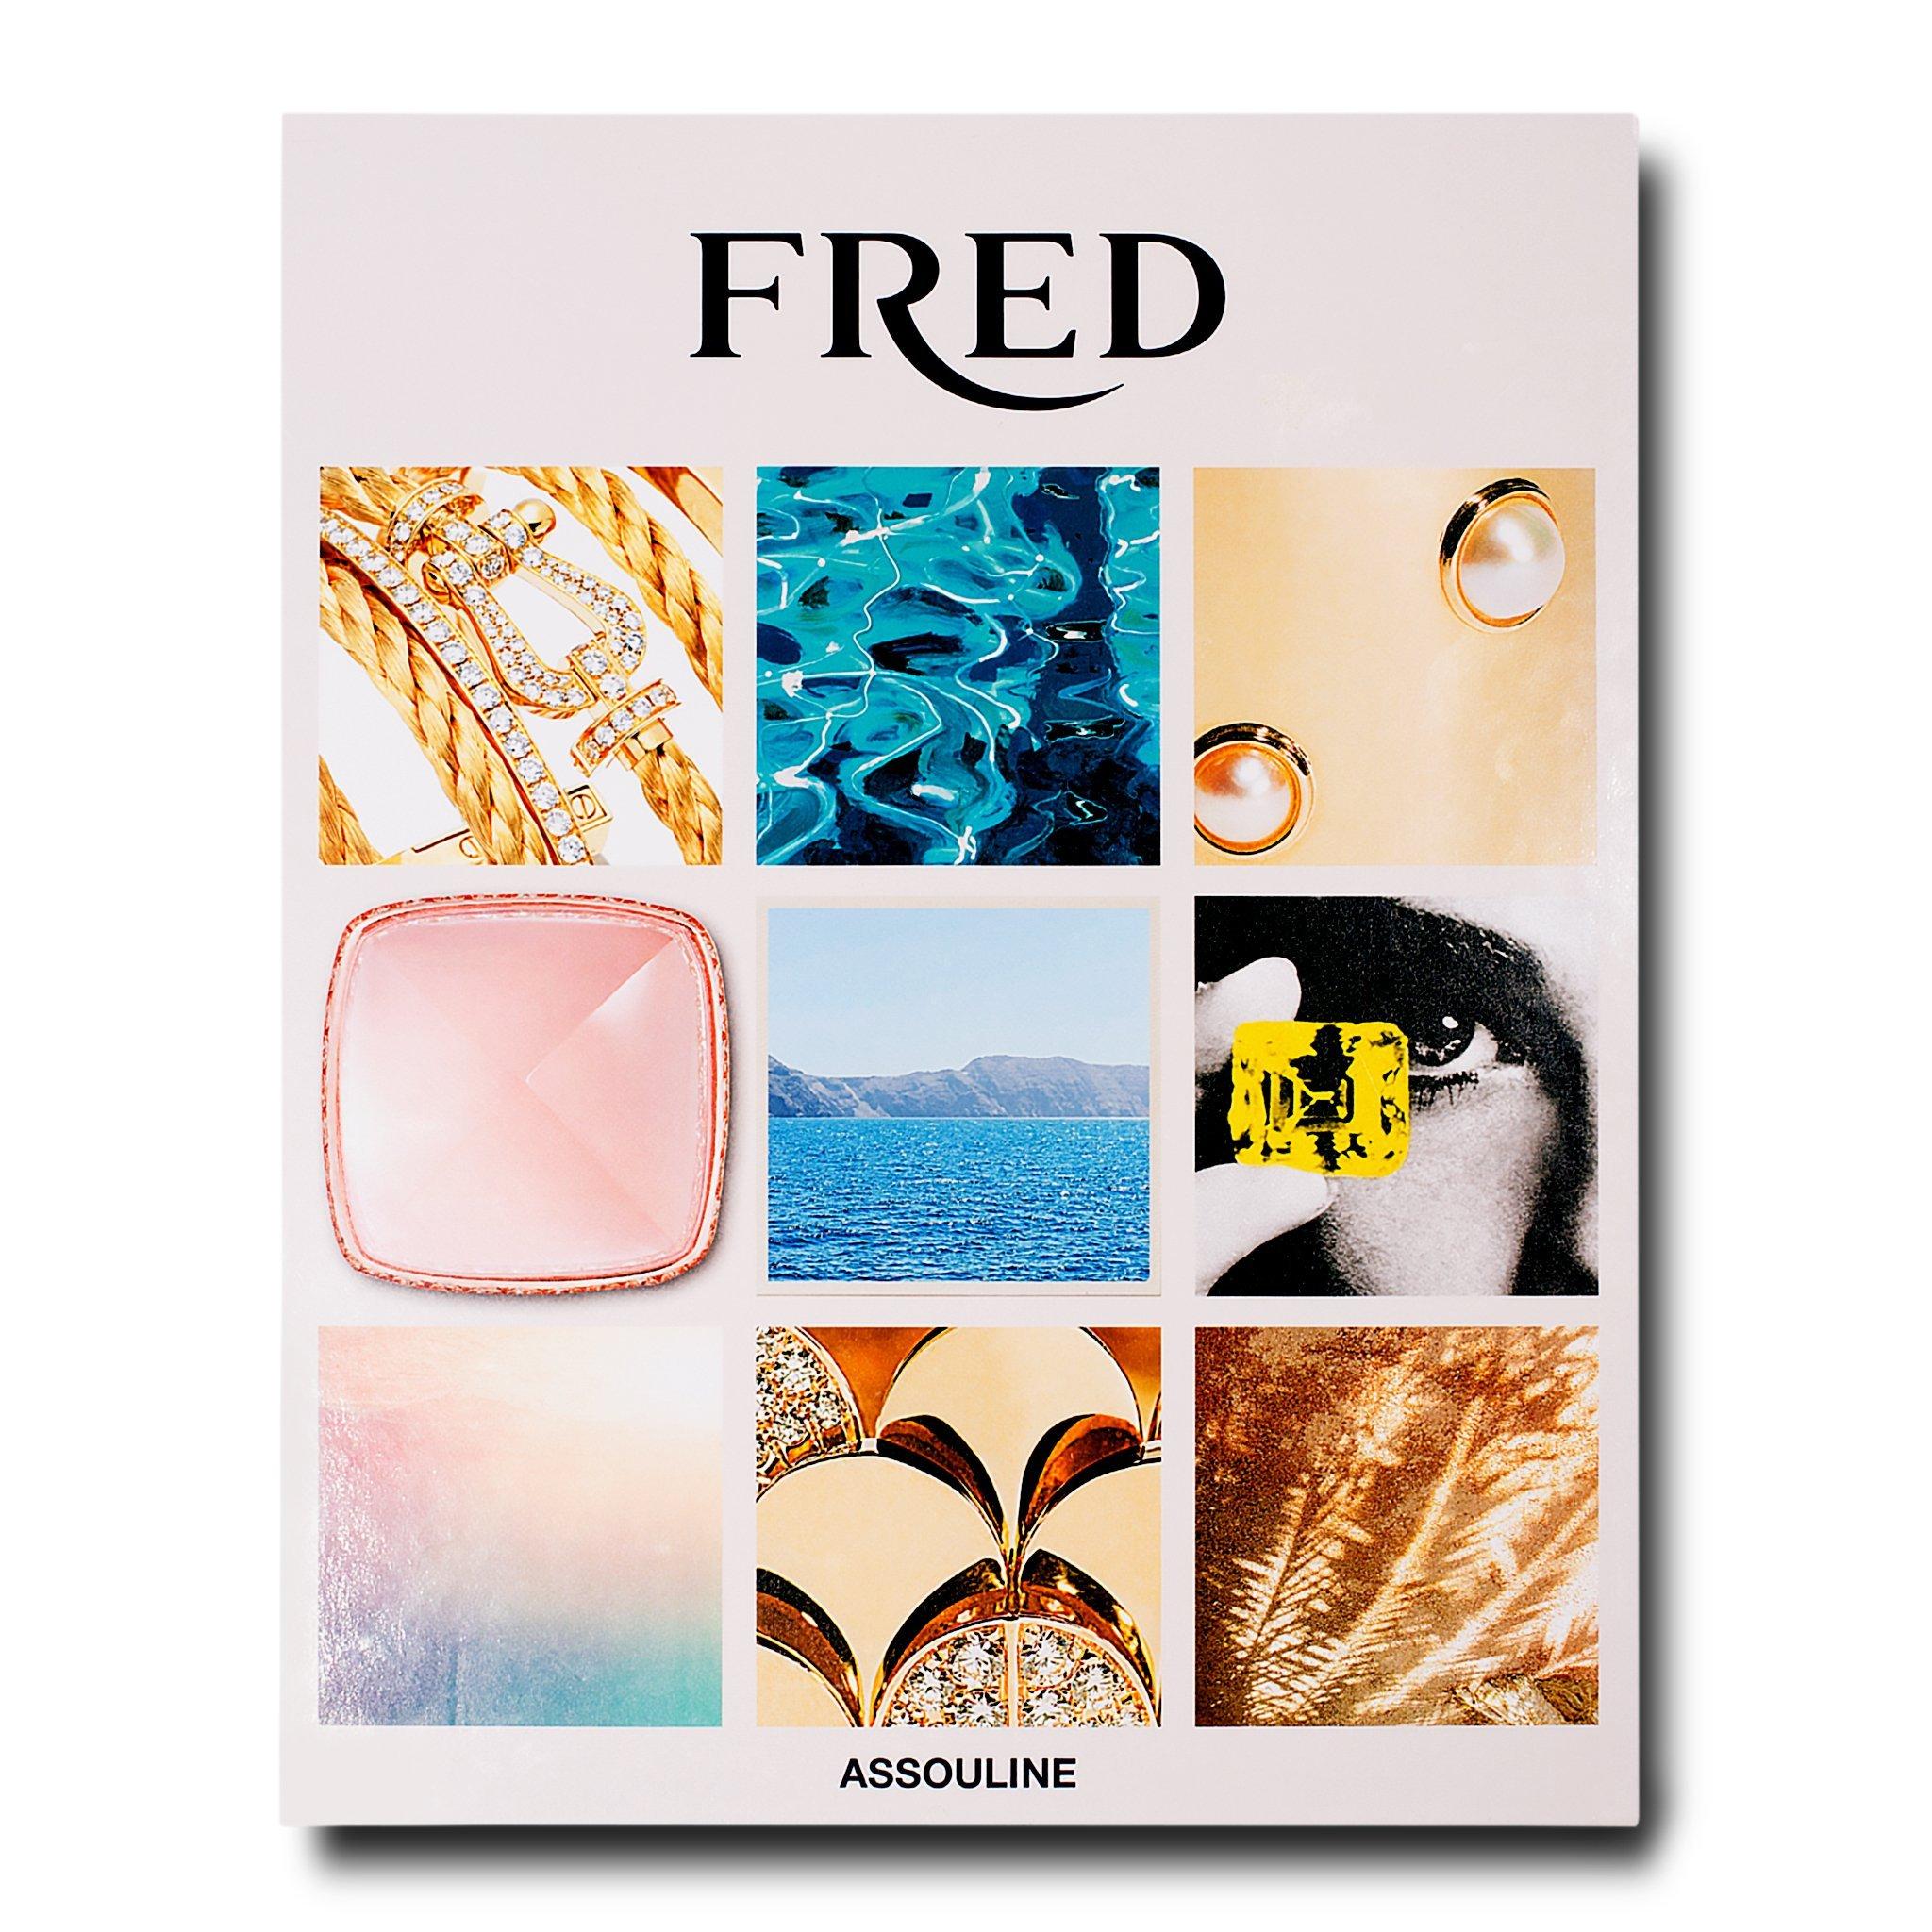 FRED-A_2048x.jpg